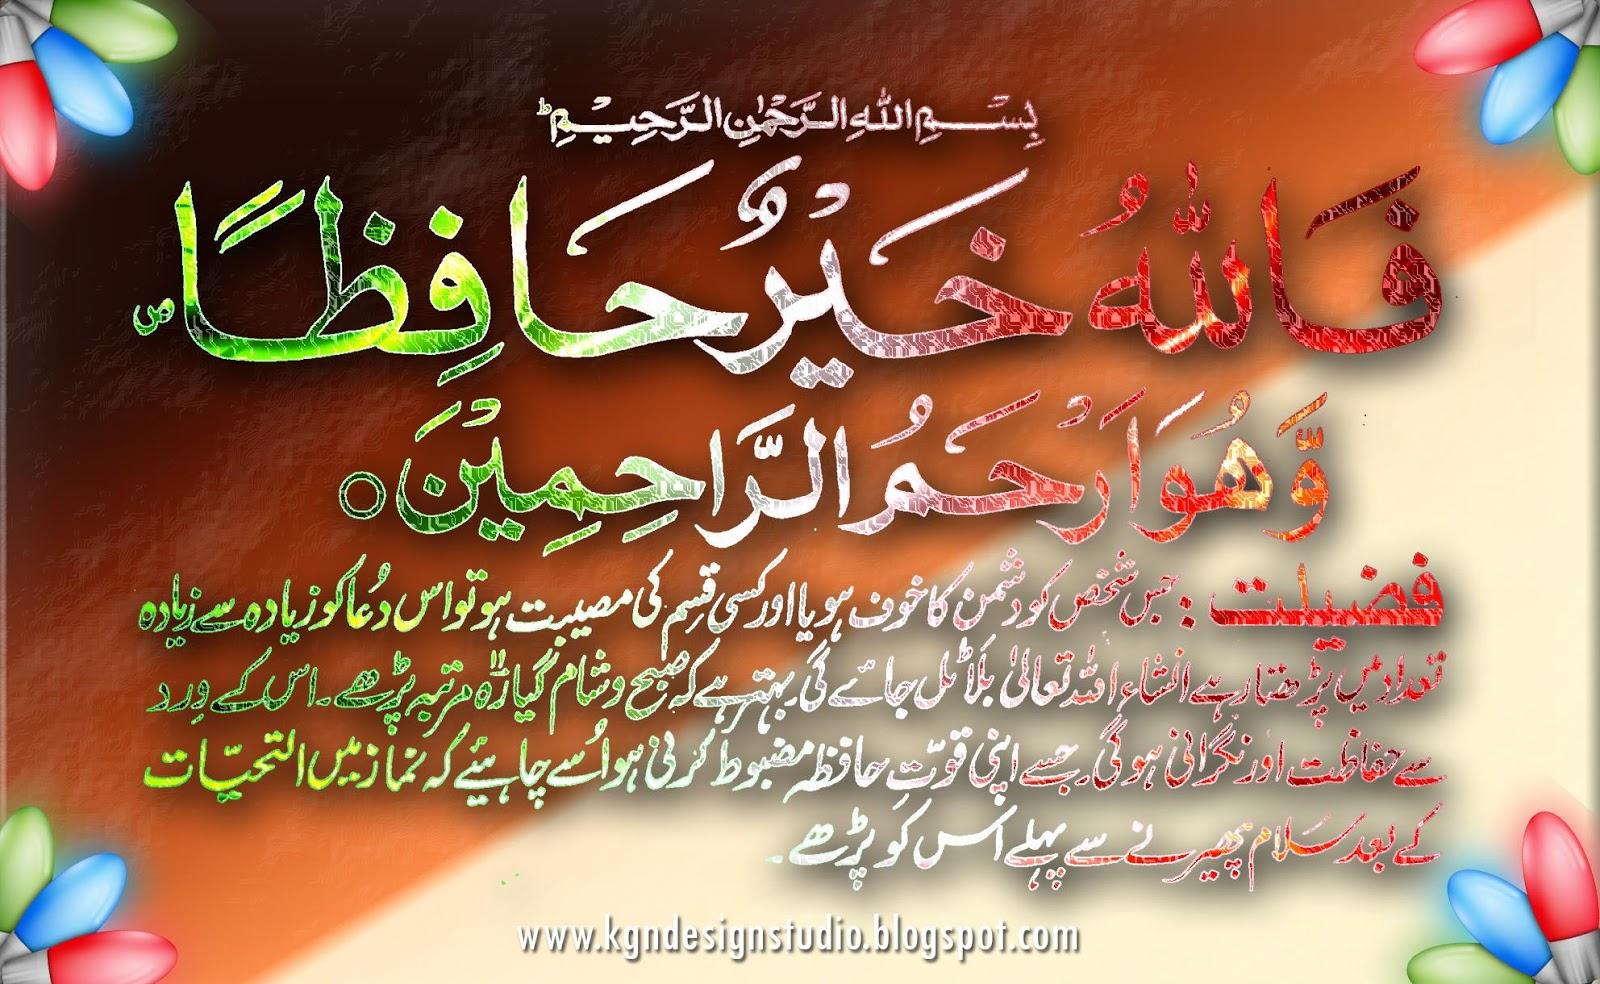 http://4.bp.blogspot.com/-JOJ-JDNoJGU/UO-xl1SjdeI/AAAAAAAACm8/y9Mji-dDCbI/s1600/Urdu+Hadees-7.jpg